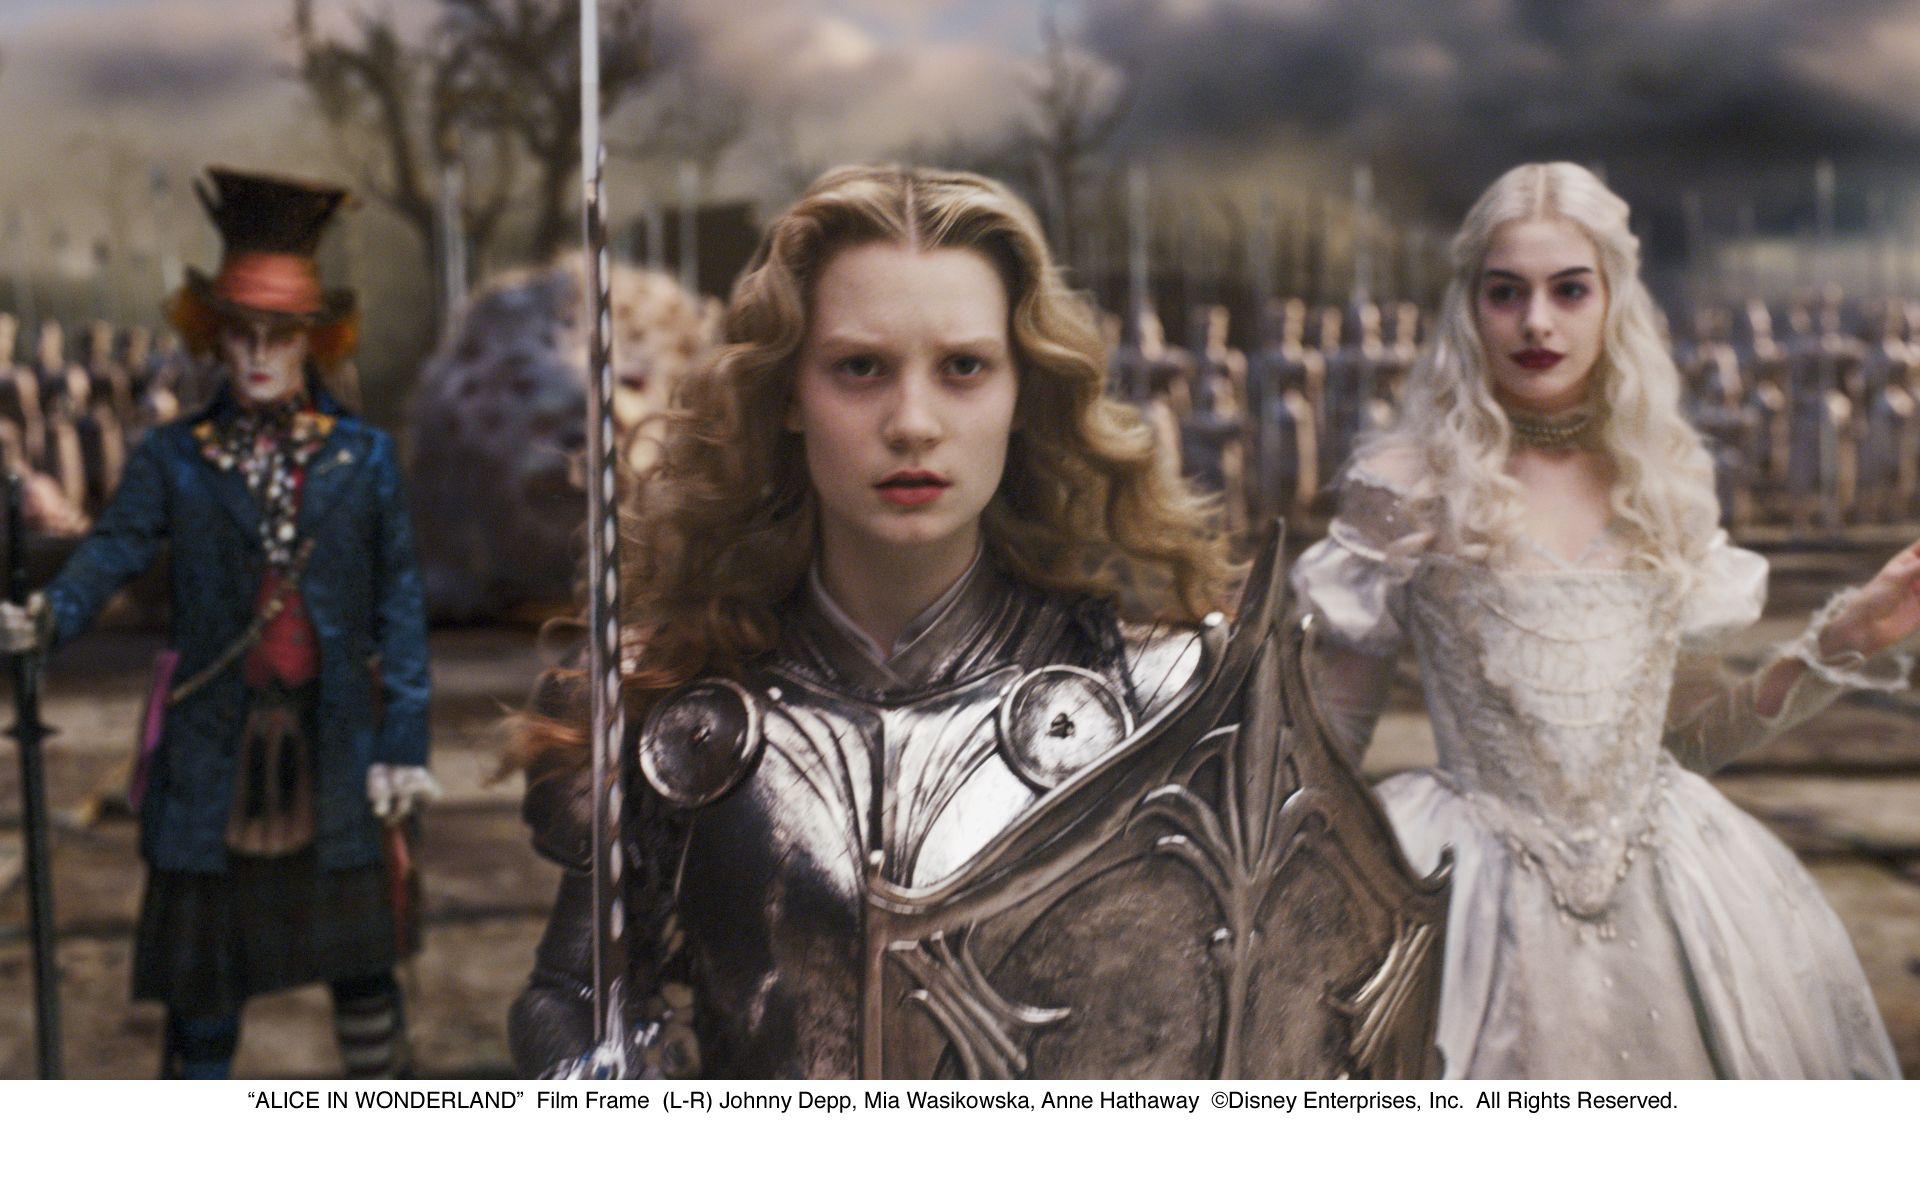 Alice in wonderland movie images | collider.